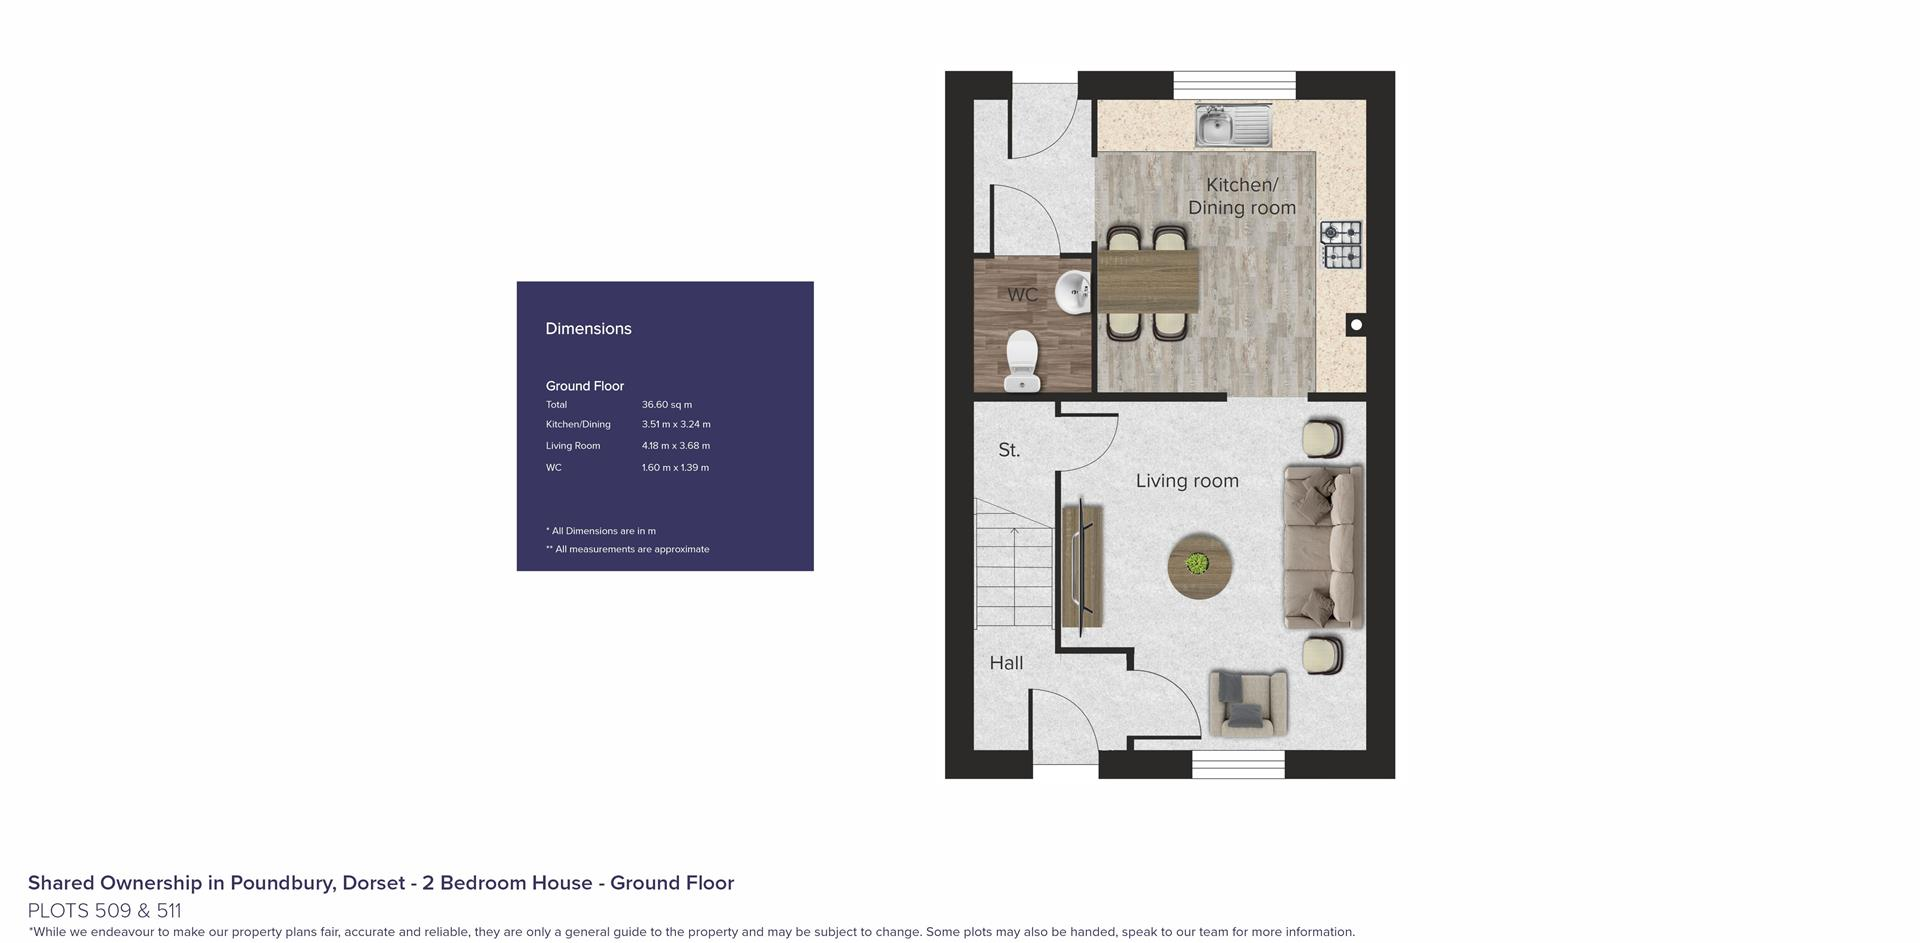 Shared Ownership in Poundbury, Dorset_Plots 509 &